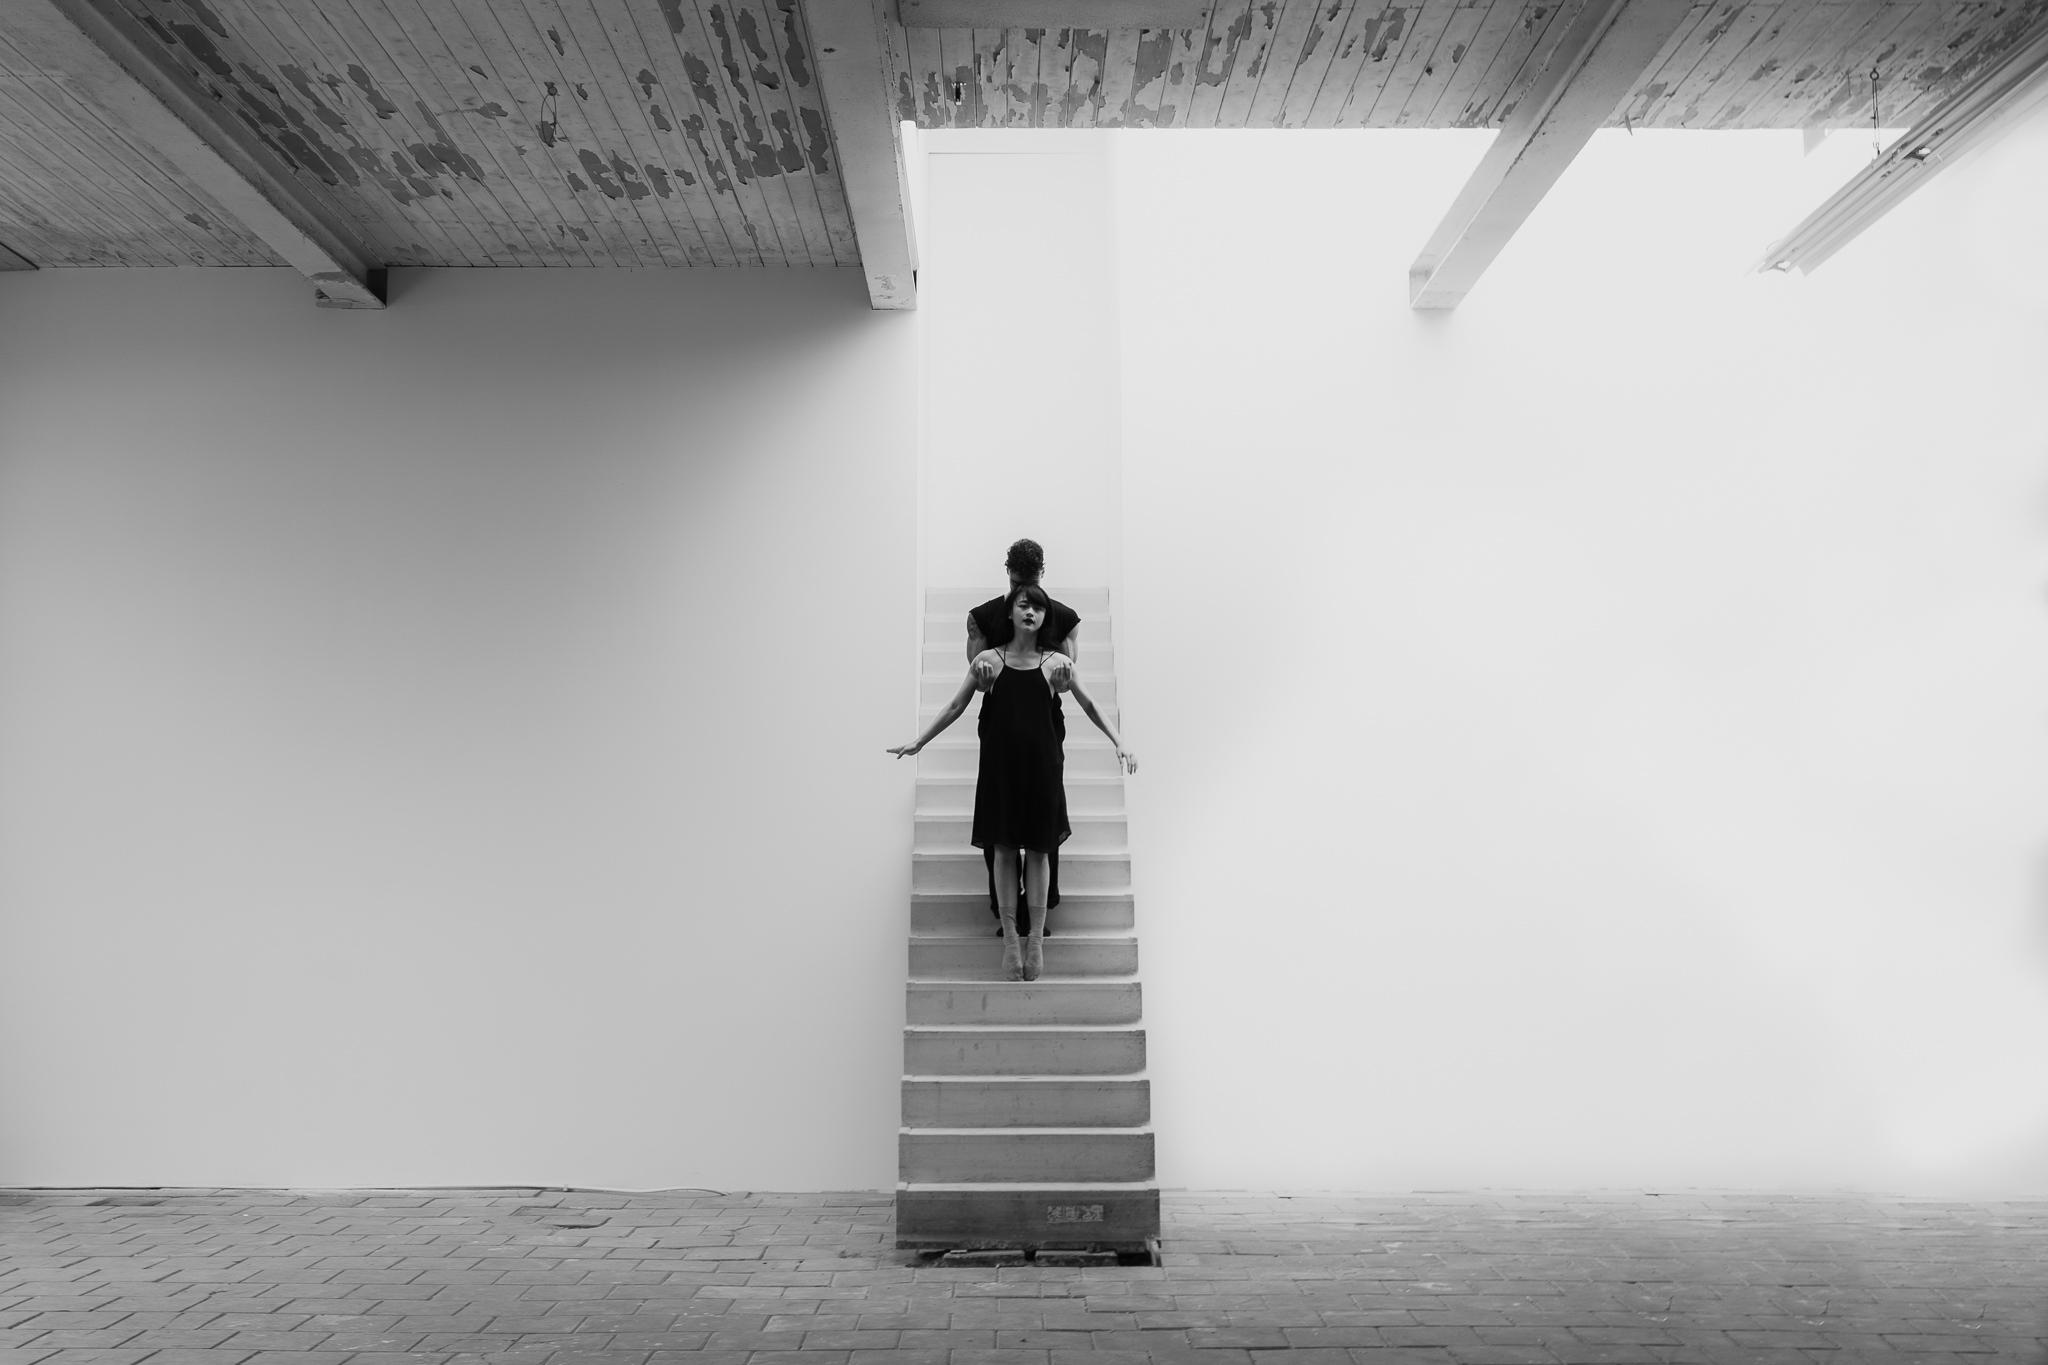 Naomi van der Kraan - Modern dance - artistic photography 23.jpg